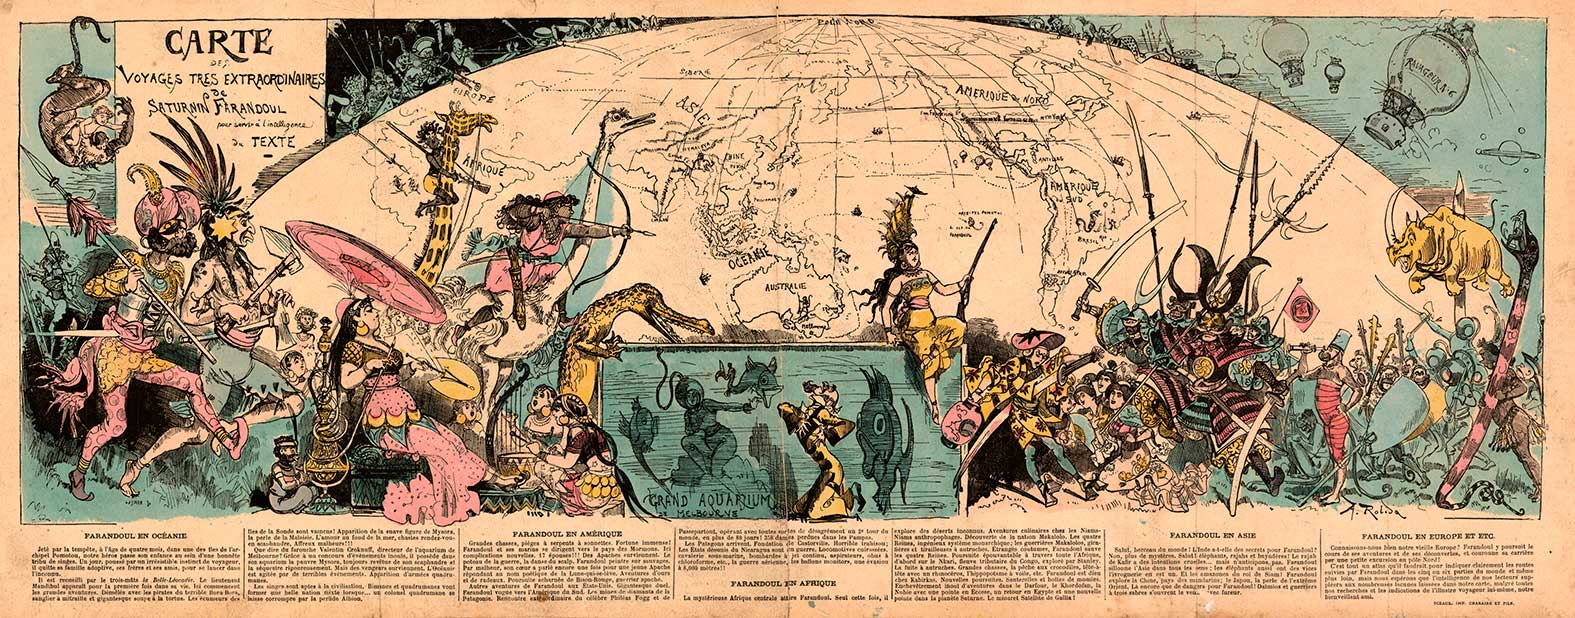 okAlbert-Robida_Carte-des-Voyages-très-Extraordinaires,-Paris-1879